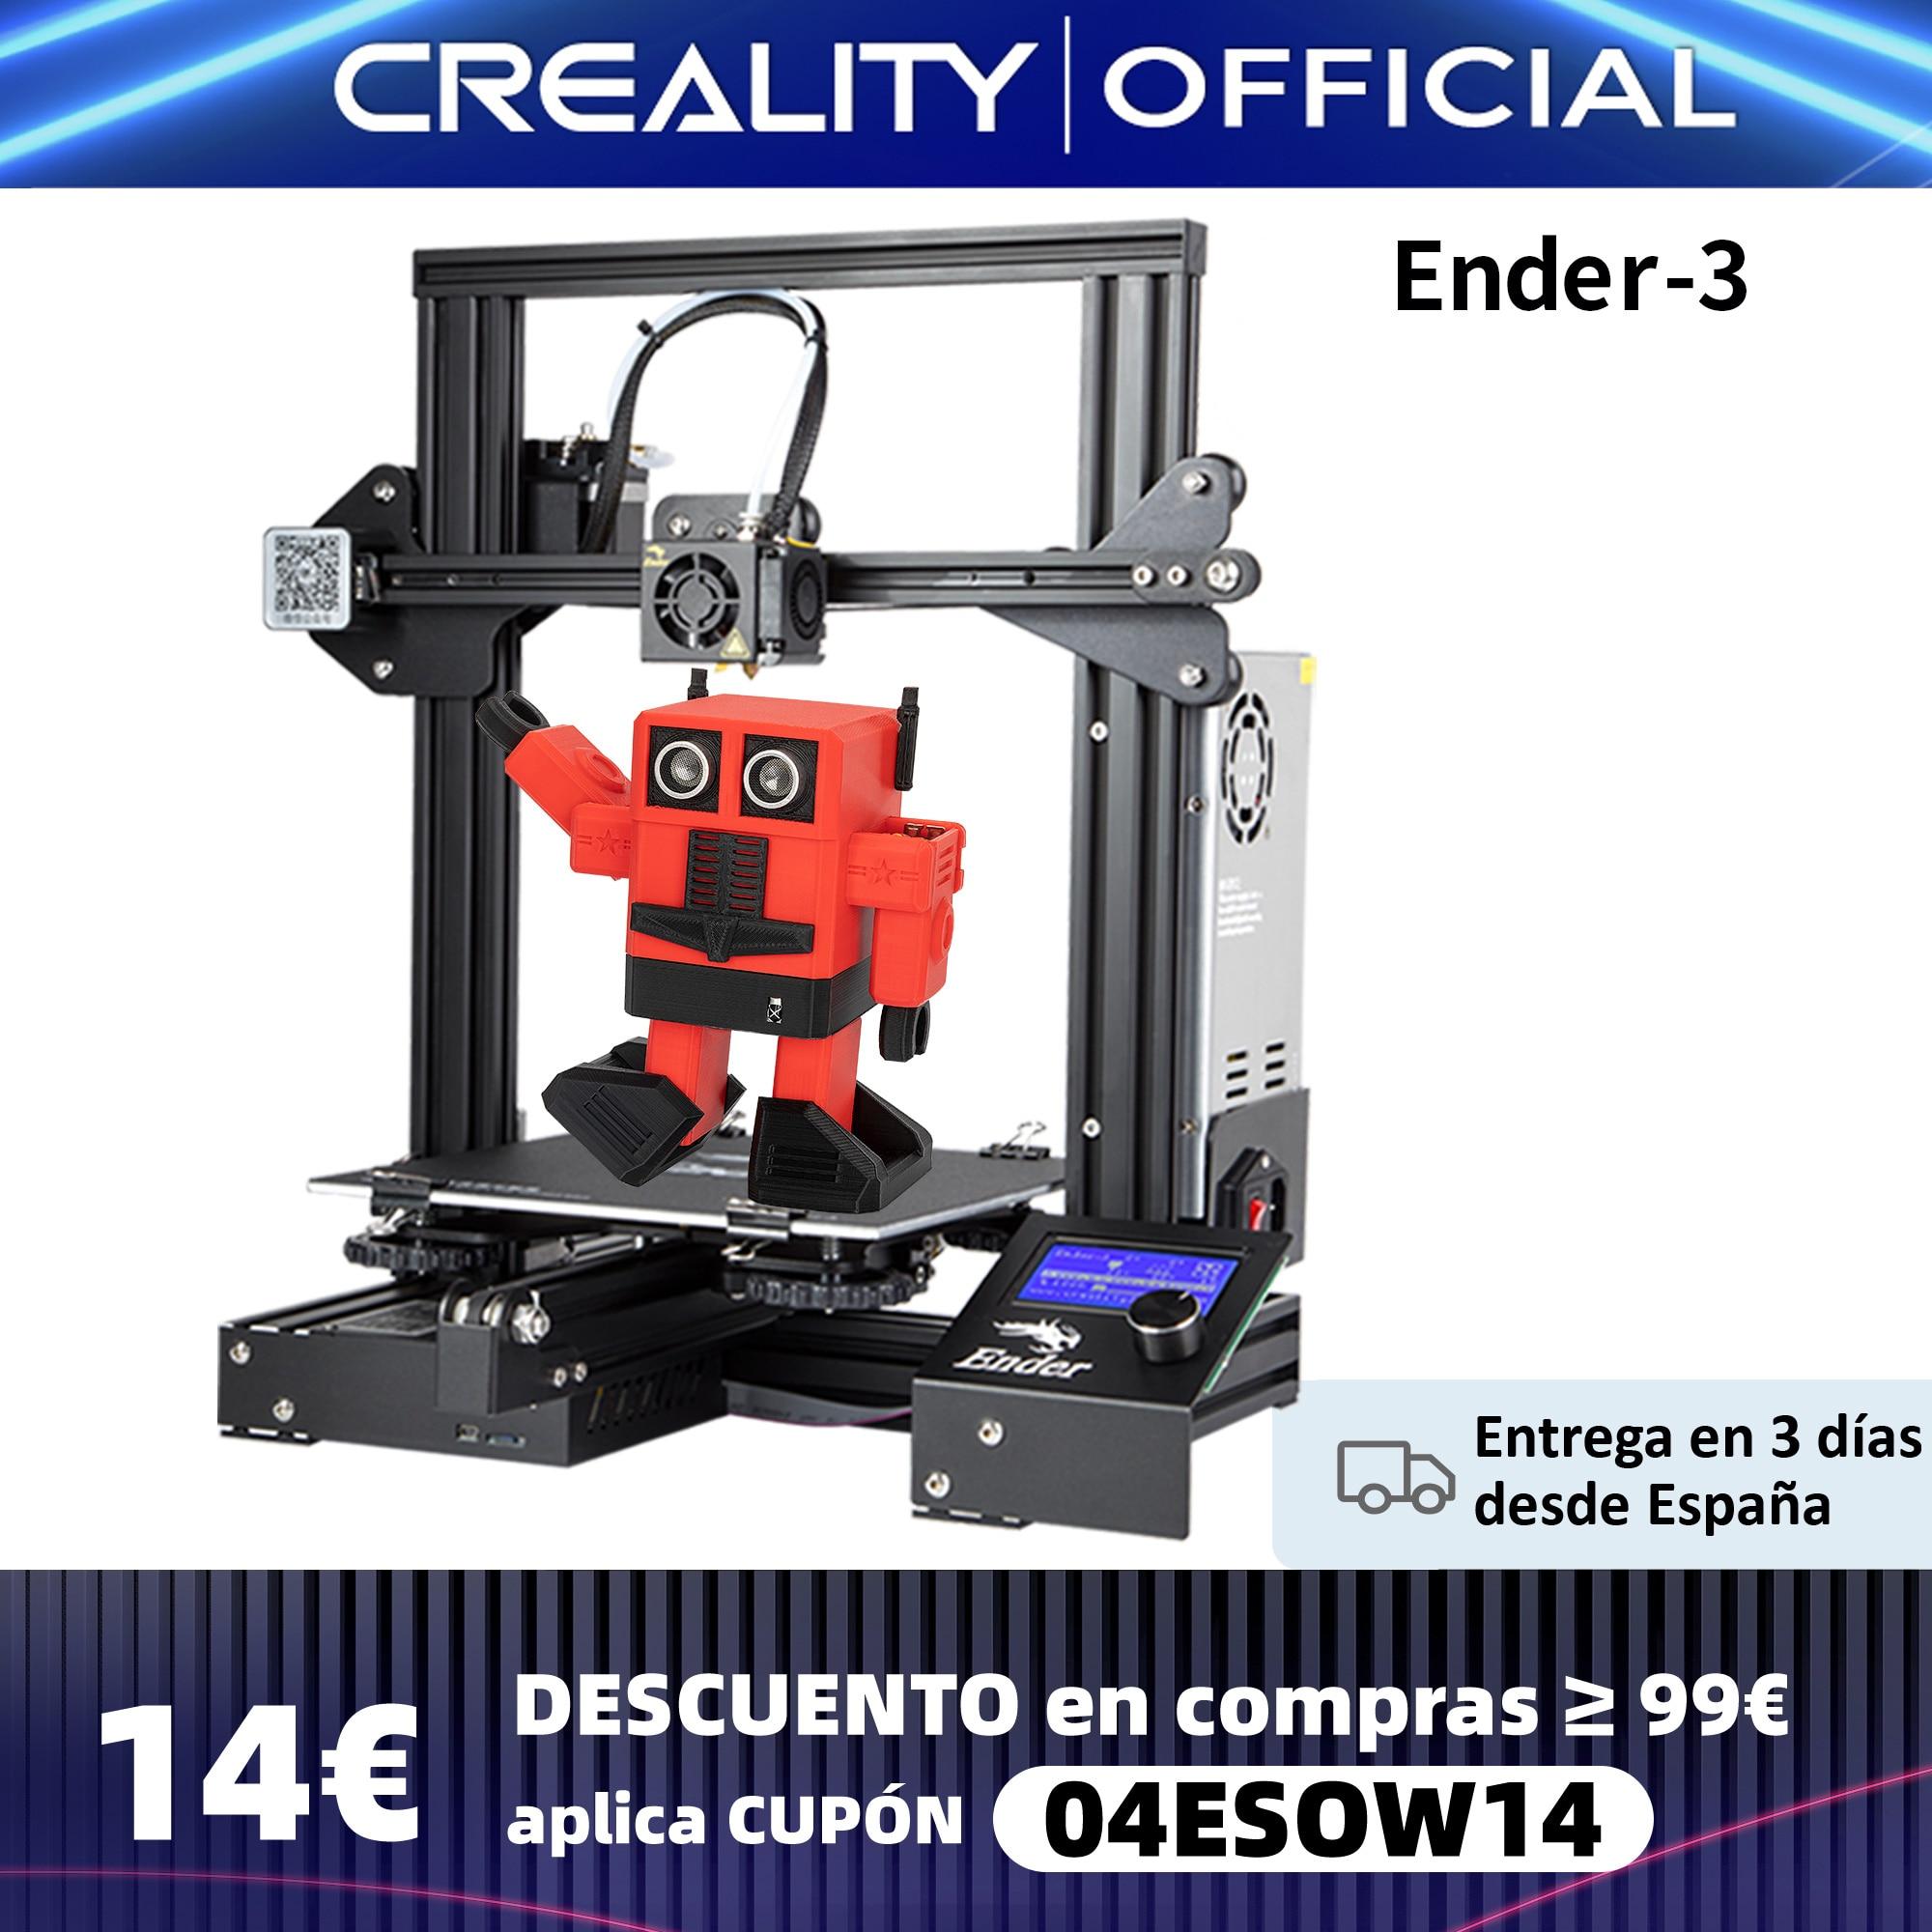 aliexpress - CREALITY 3D Printer Ender-3/Ender-3X Upgraded Optional,V-slot Resume Power Failure Printing Masks KIT Hotbed